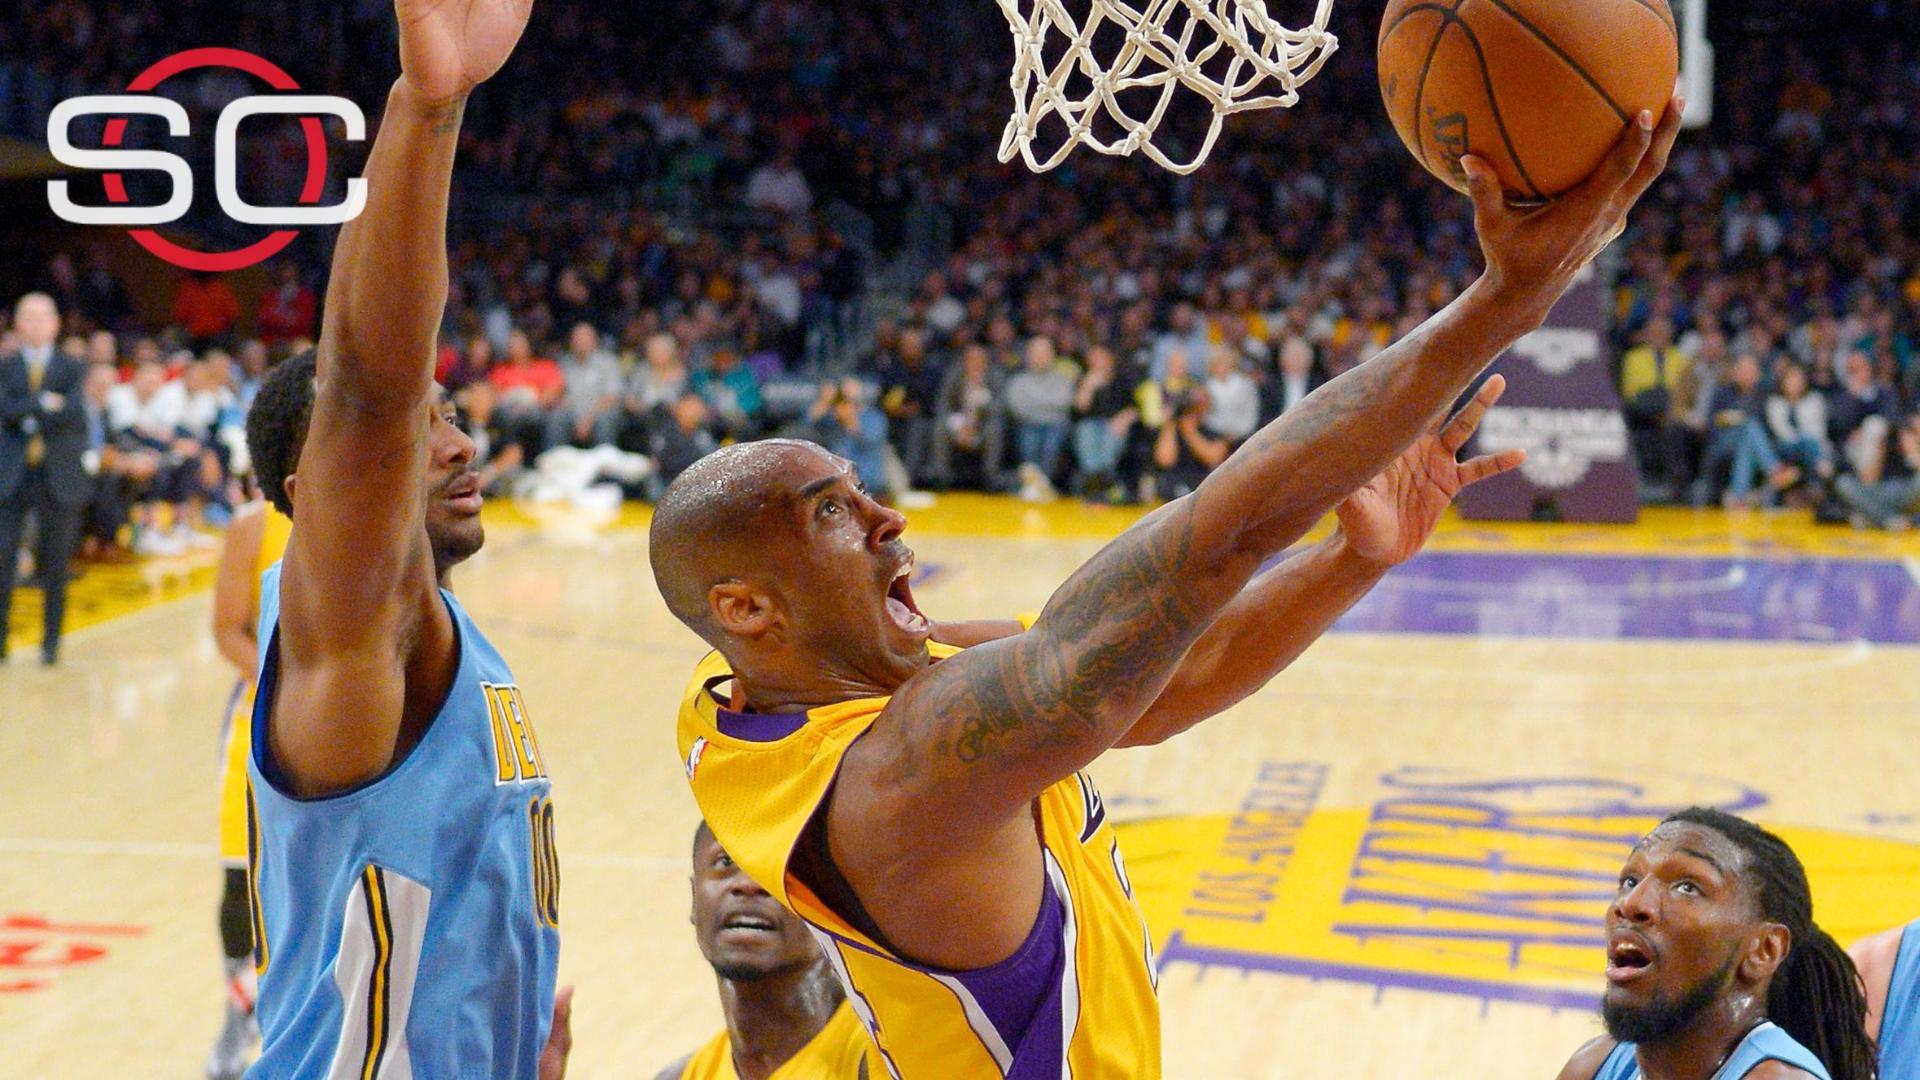 021f0f936d2 LeBron James  Kobe Bryant  knows he don t suck  - ABC News